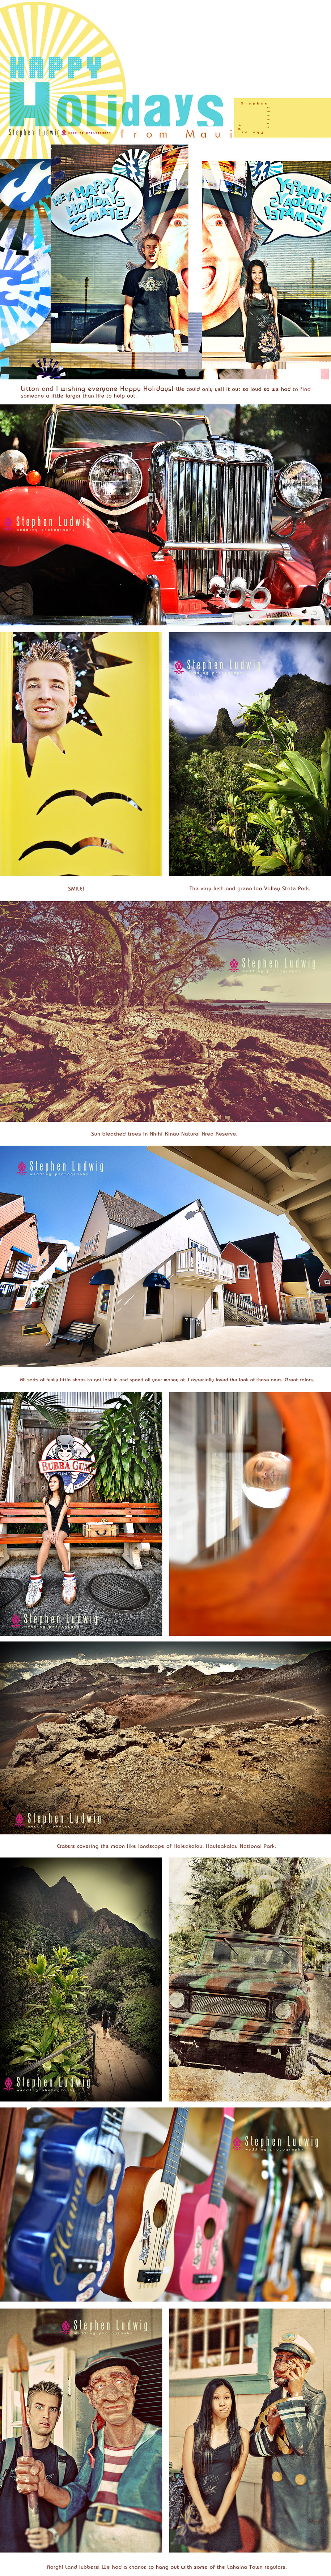 stephen-ludwig-photography-maui-trip-1 copy